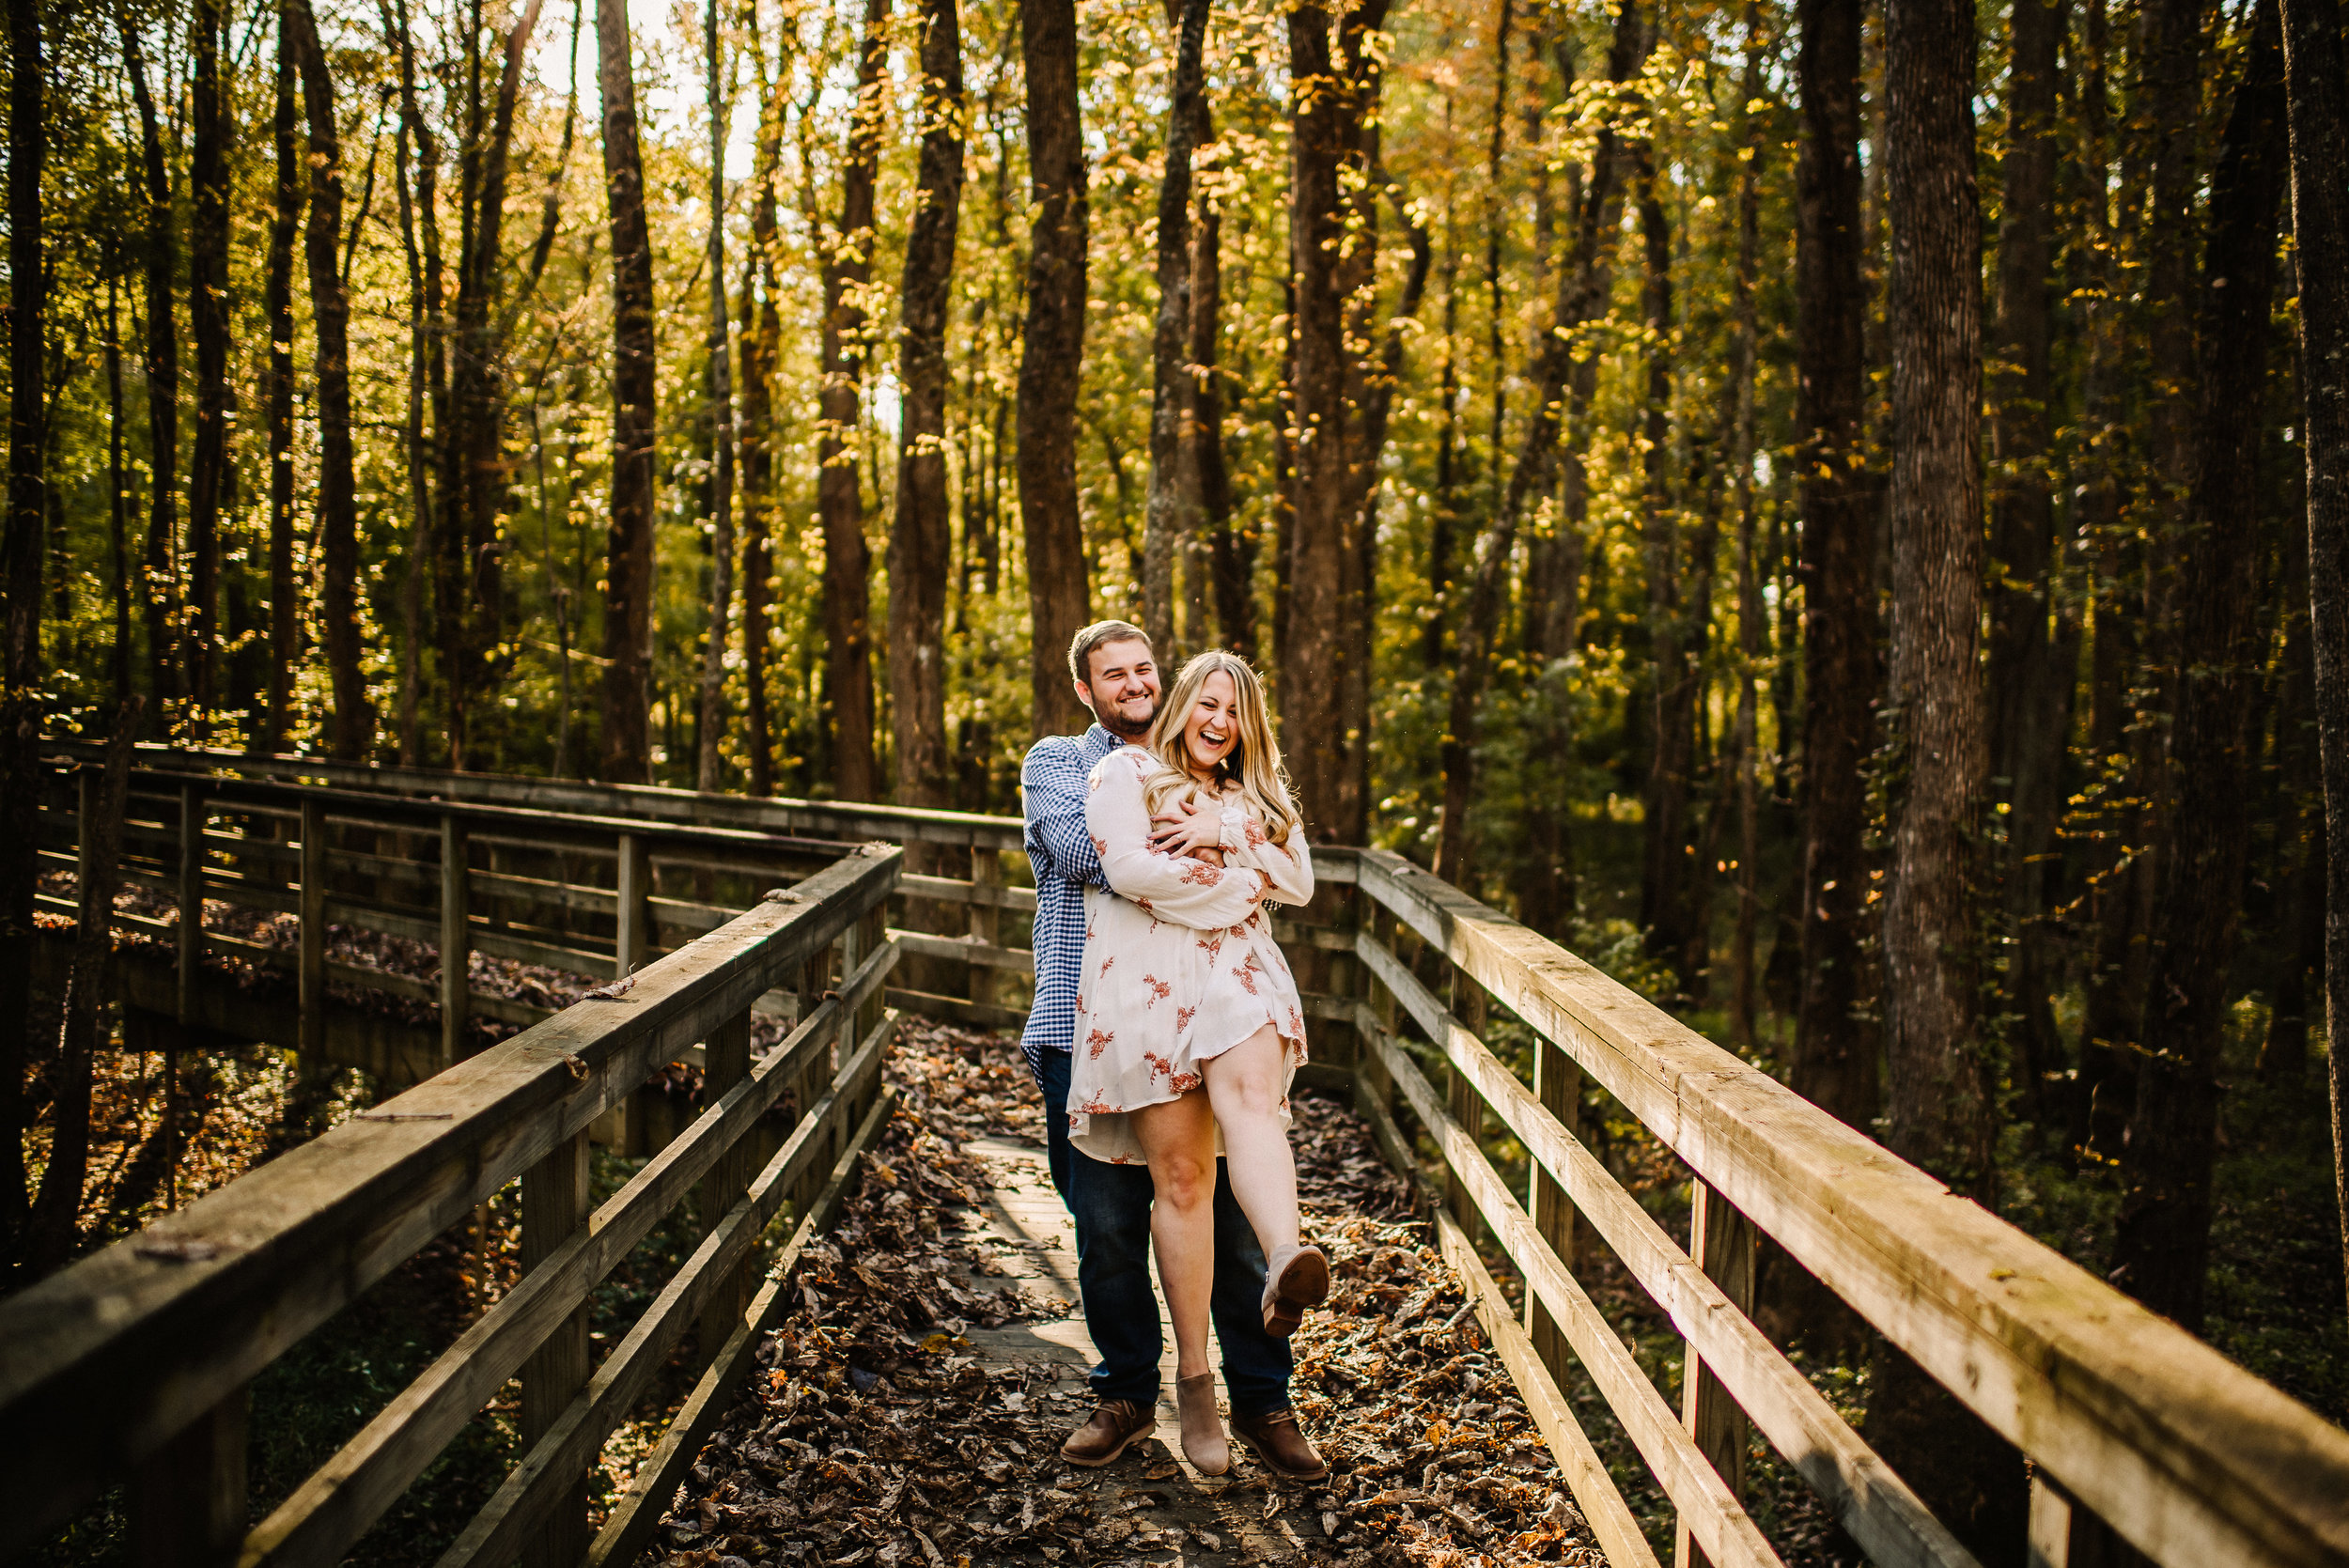 Romantic Fall Engagement Photography_Alexis & Jacob_Ashley Benham Photography-45.jpg